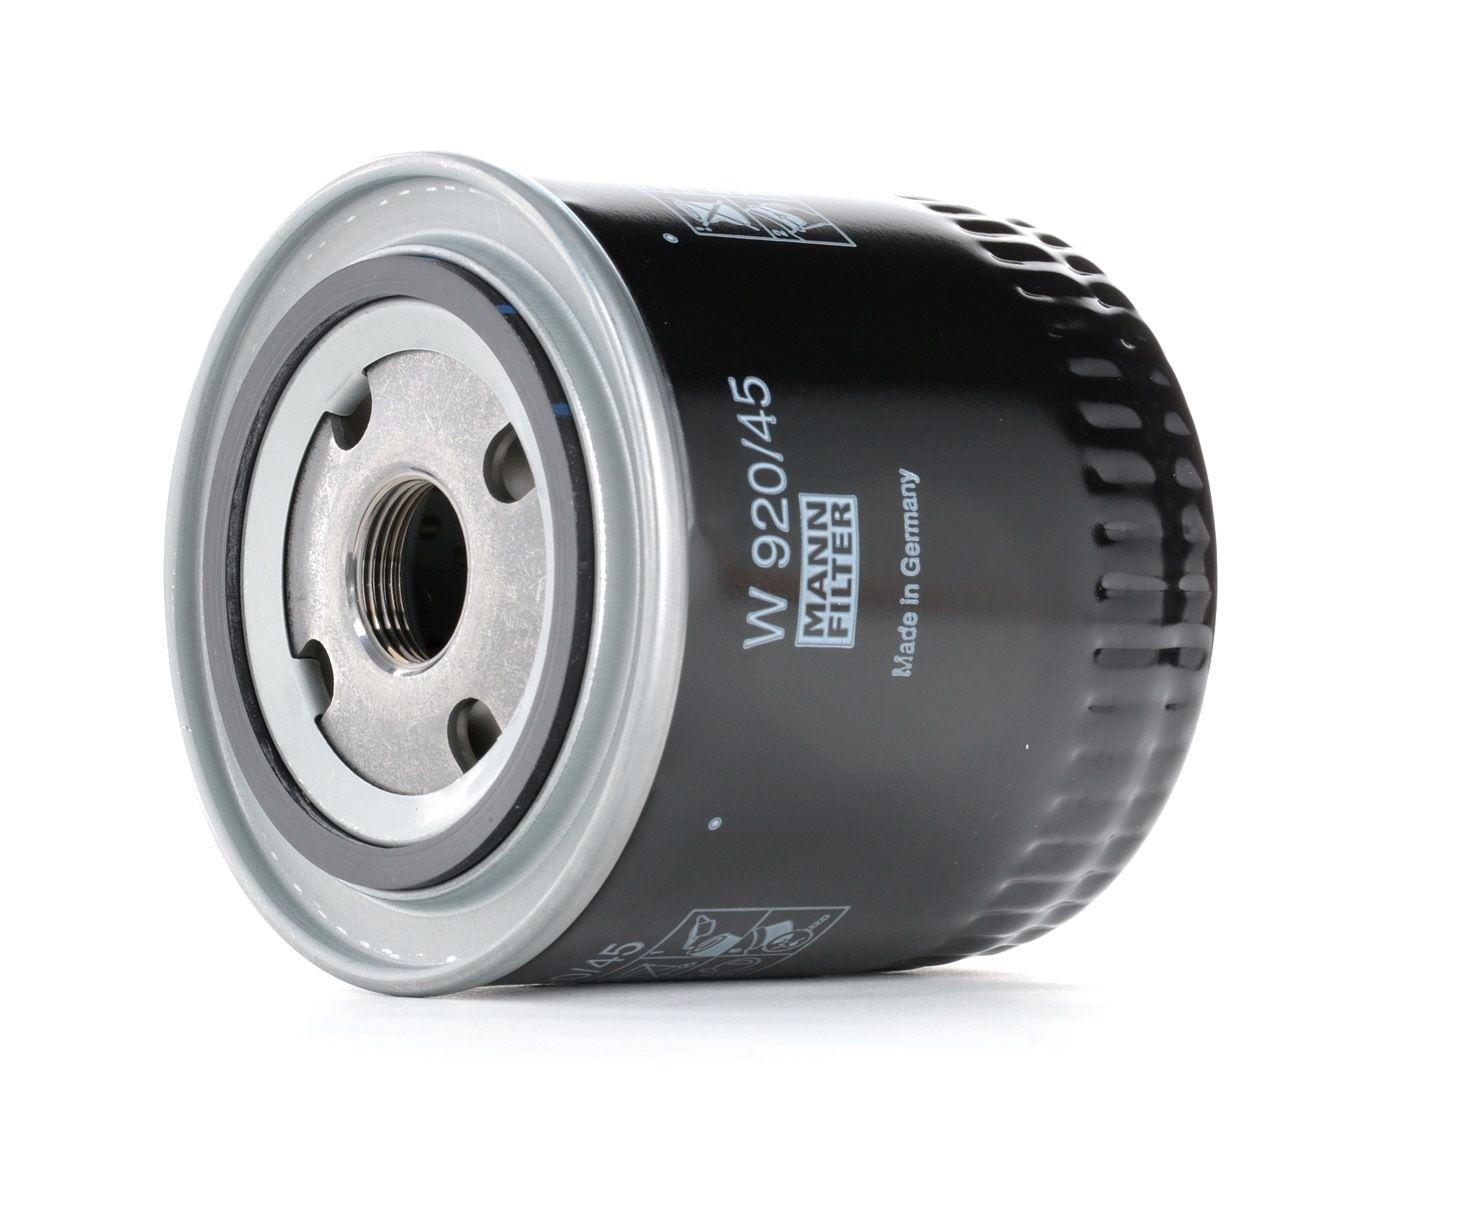 MANN-FILTER: Original Ölfilter W 920/45 (Innendurchmesser 2: 62mm, Innendurchmesser 2: 62mm, Ø: 93mm, Außendurchmesser 2: 71mm, Höhe: 95mm)